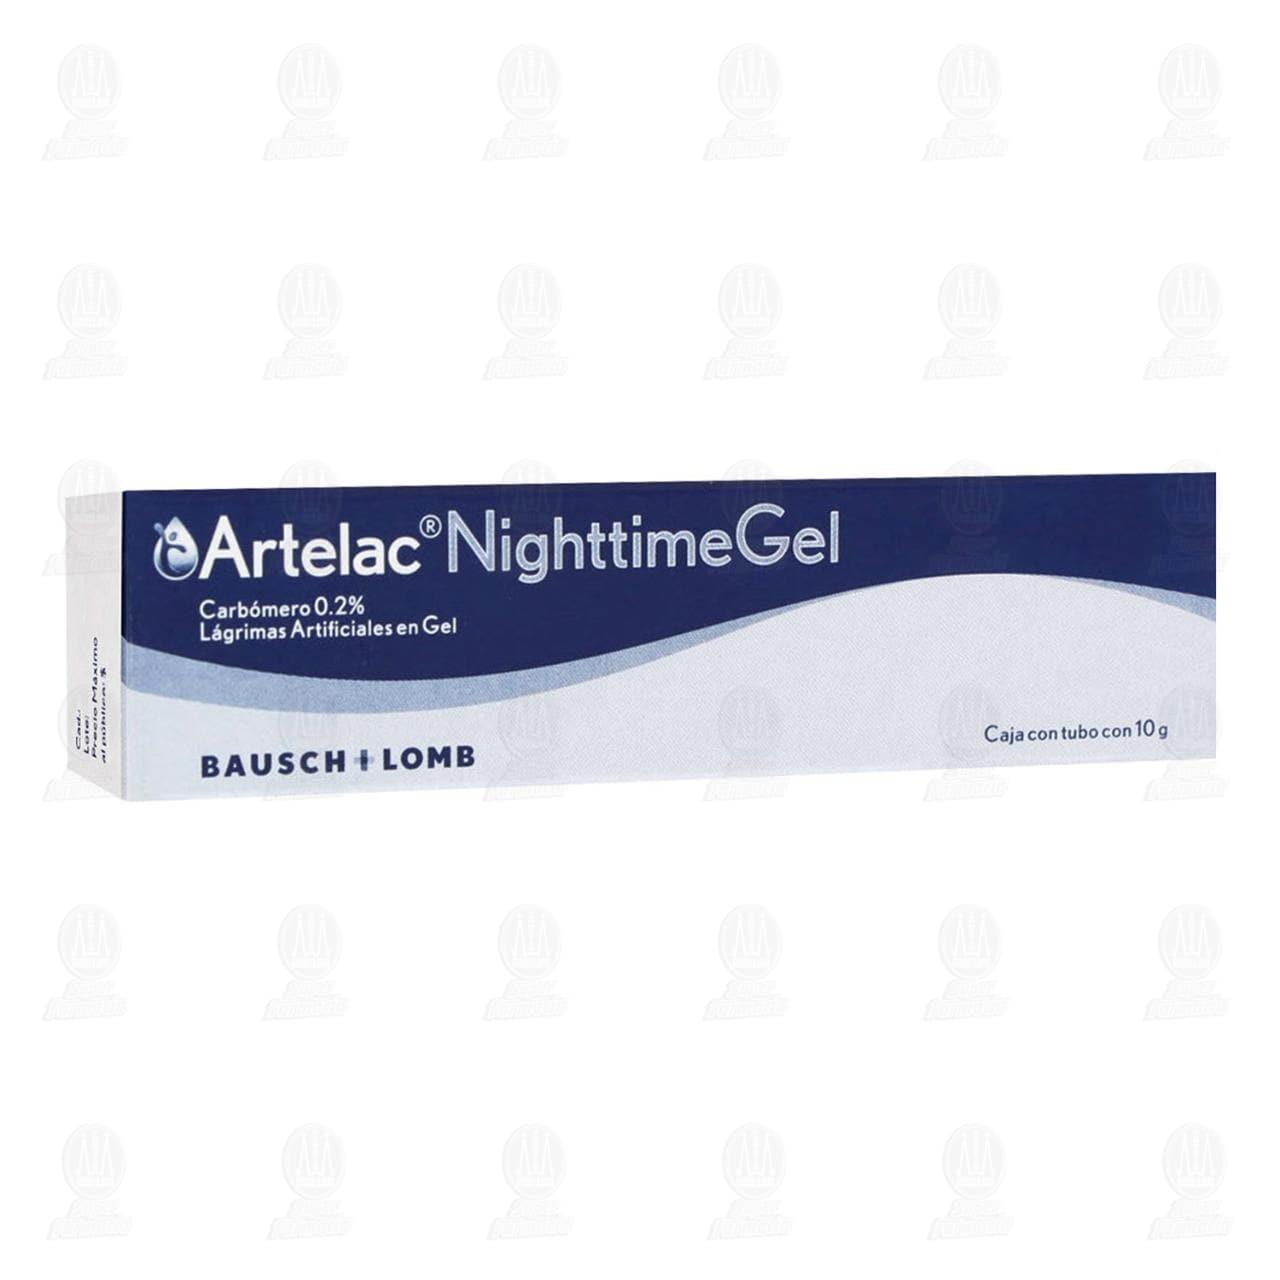 Comprar Artelac Nighttime Gel 0.2% 10gr en Farmacias Guadalajara